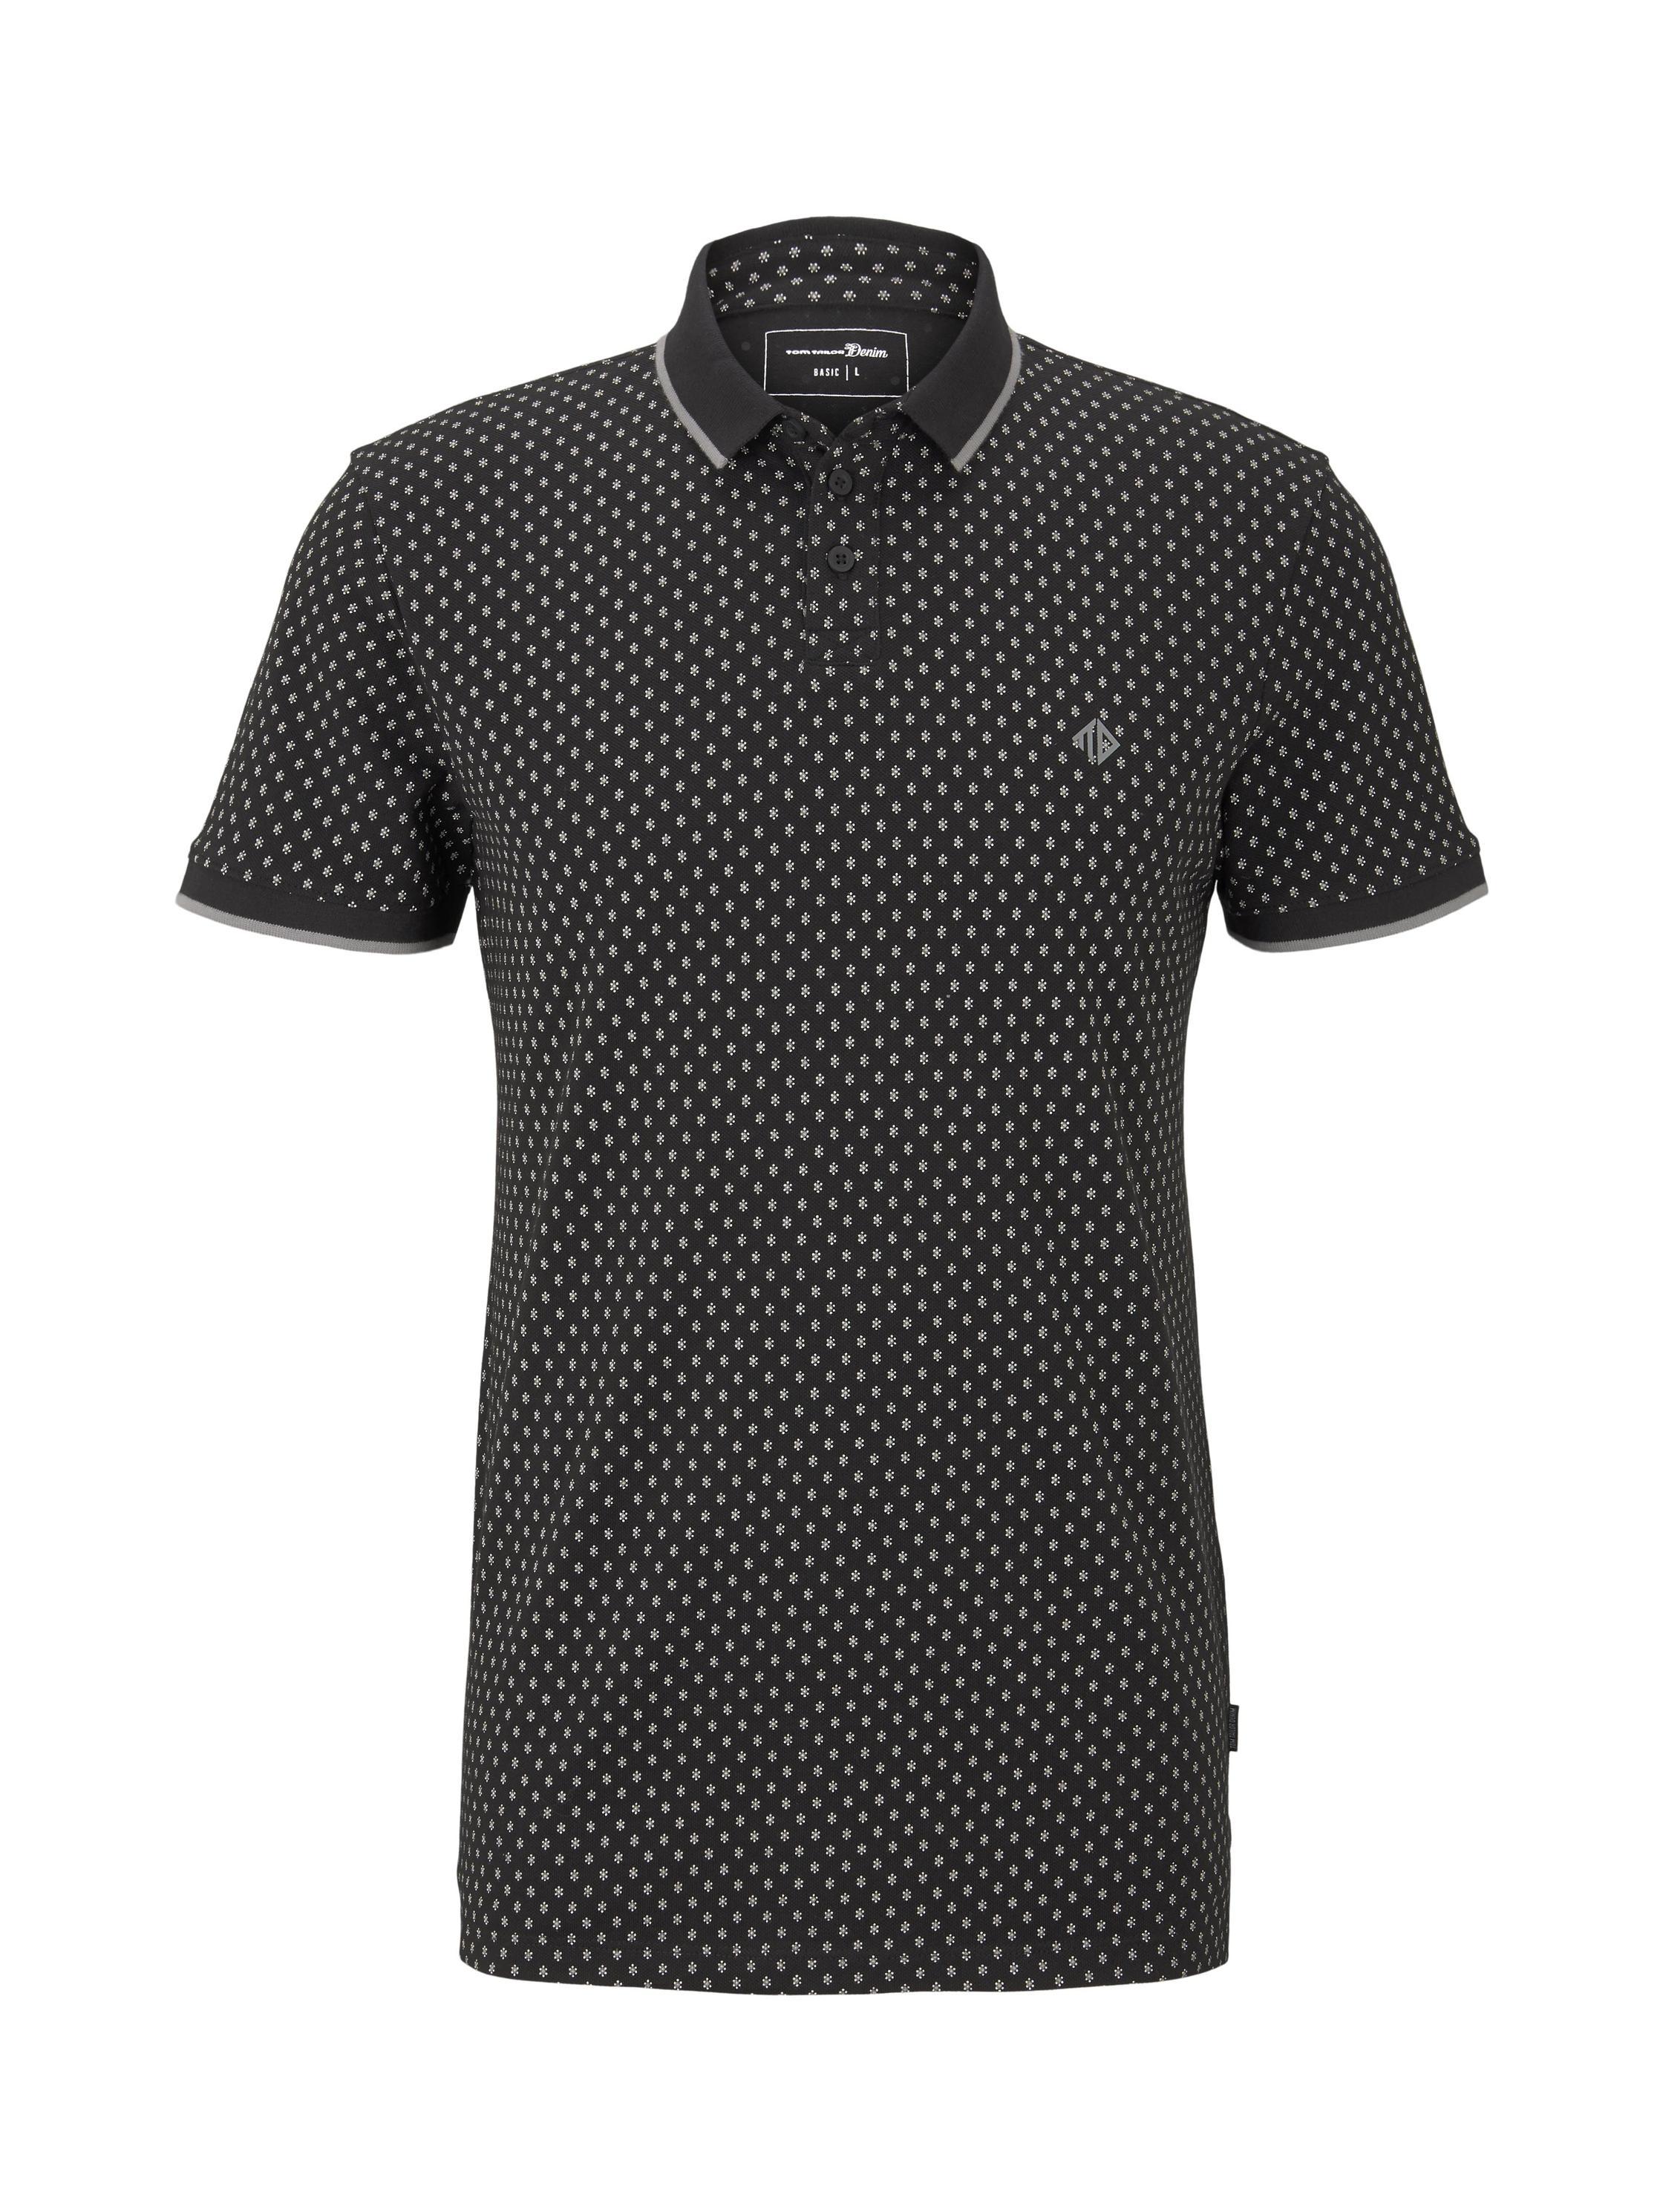 alloverprinted polo, black small diamond dot print